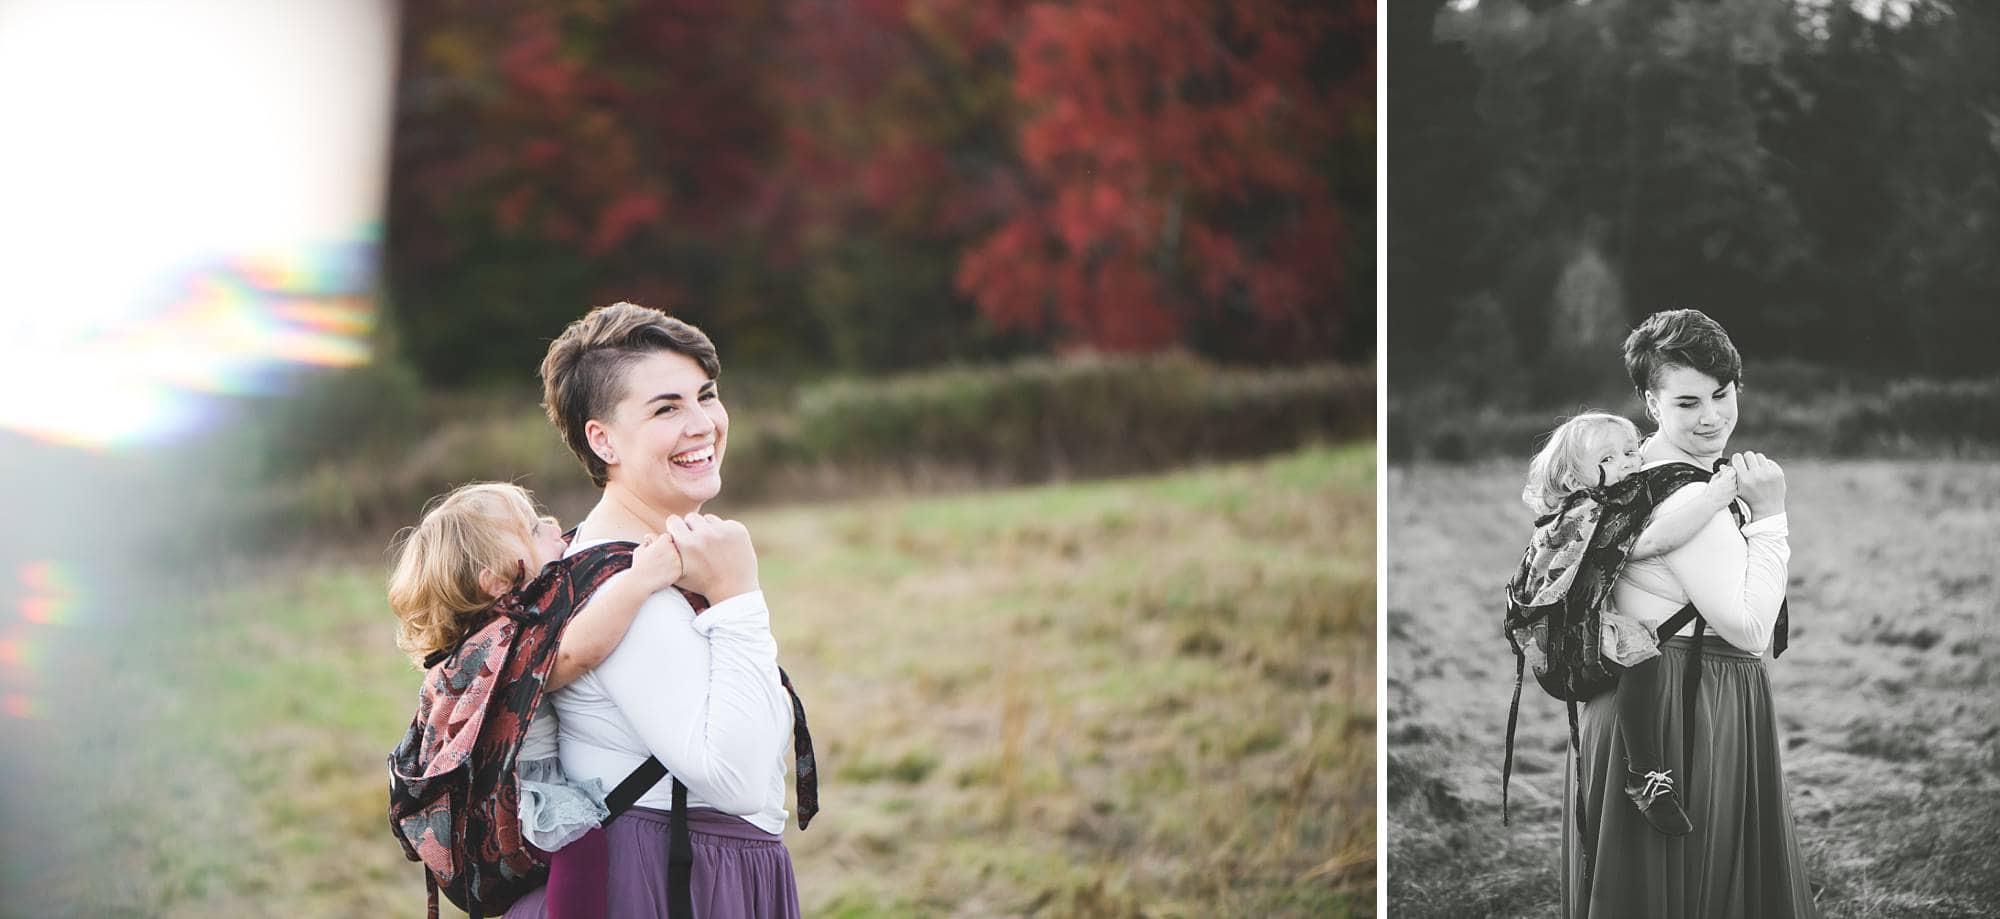 Mom wearing toddler girl in an onbu in a field